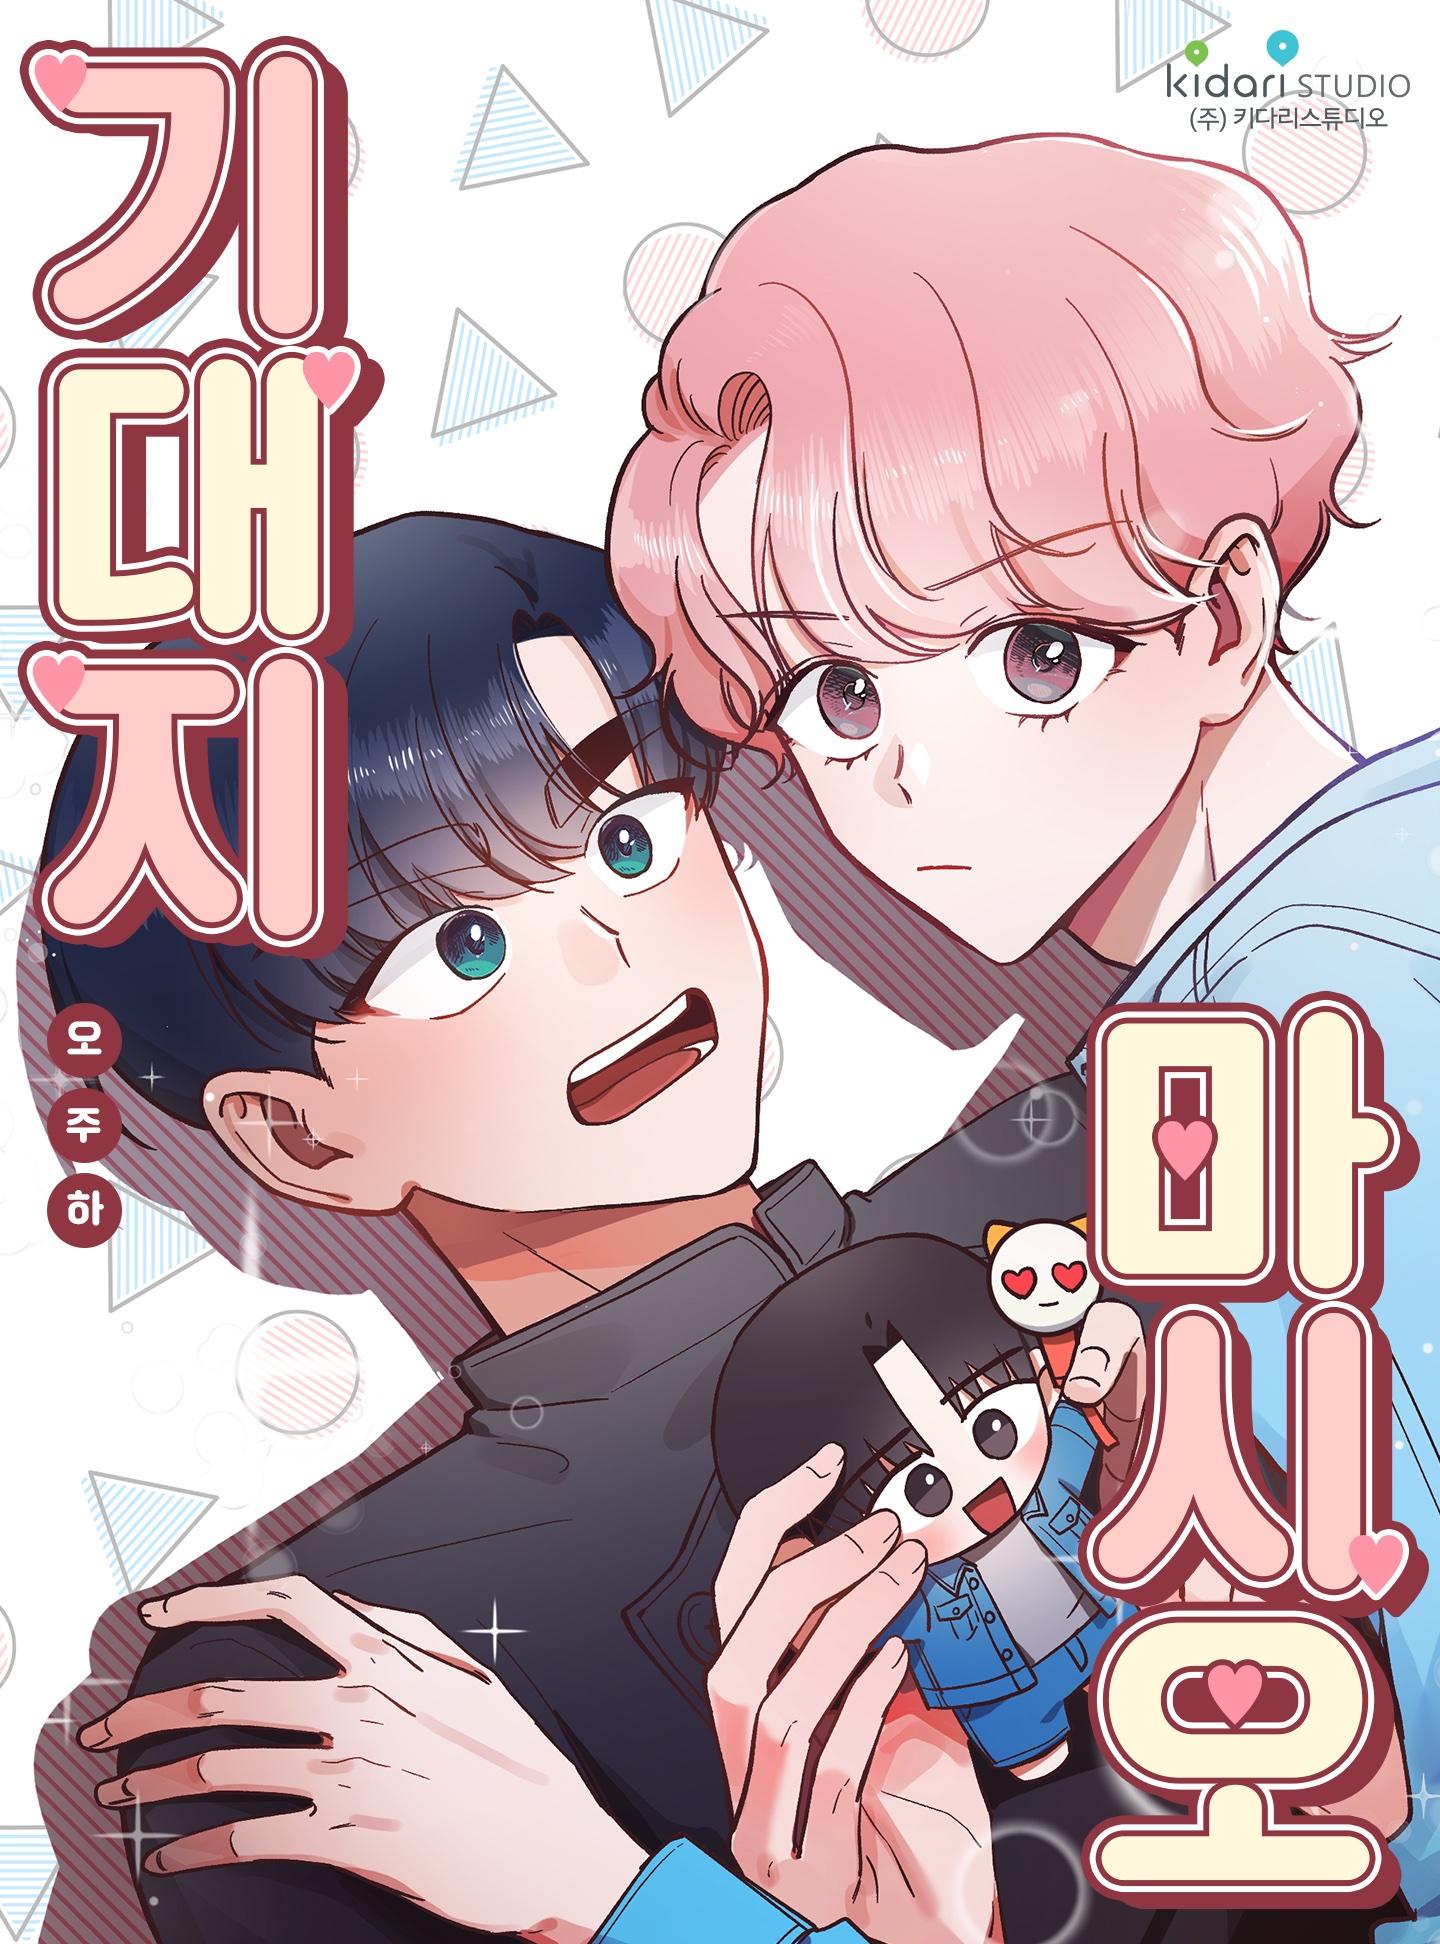 On My Own Yaoi Wiki Fandom Full anime n'héberge aucune vidéo ni n'upload aucune vidéo vers une plateforme tiers. on my own yaoi wiki fandom